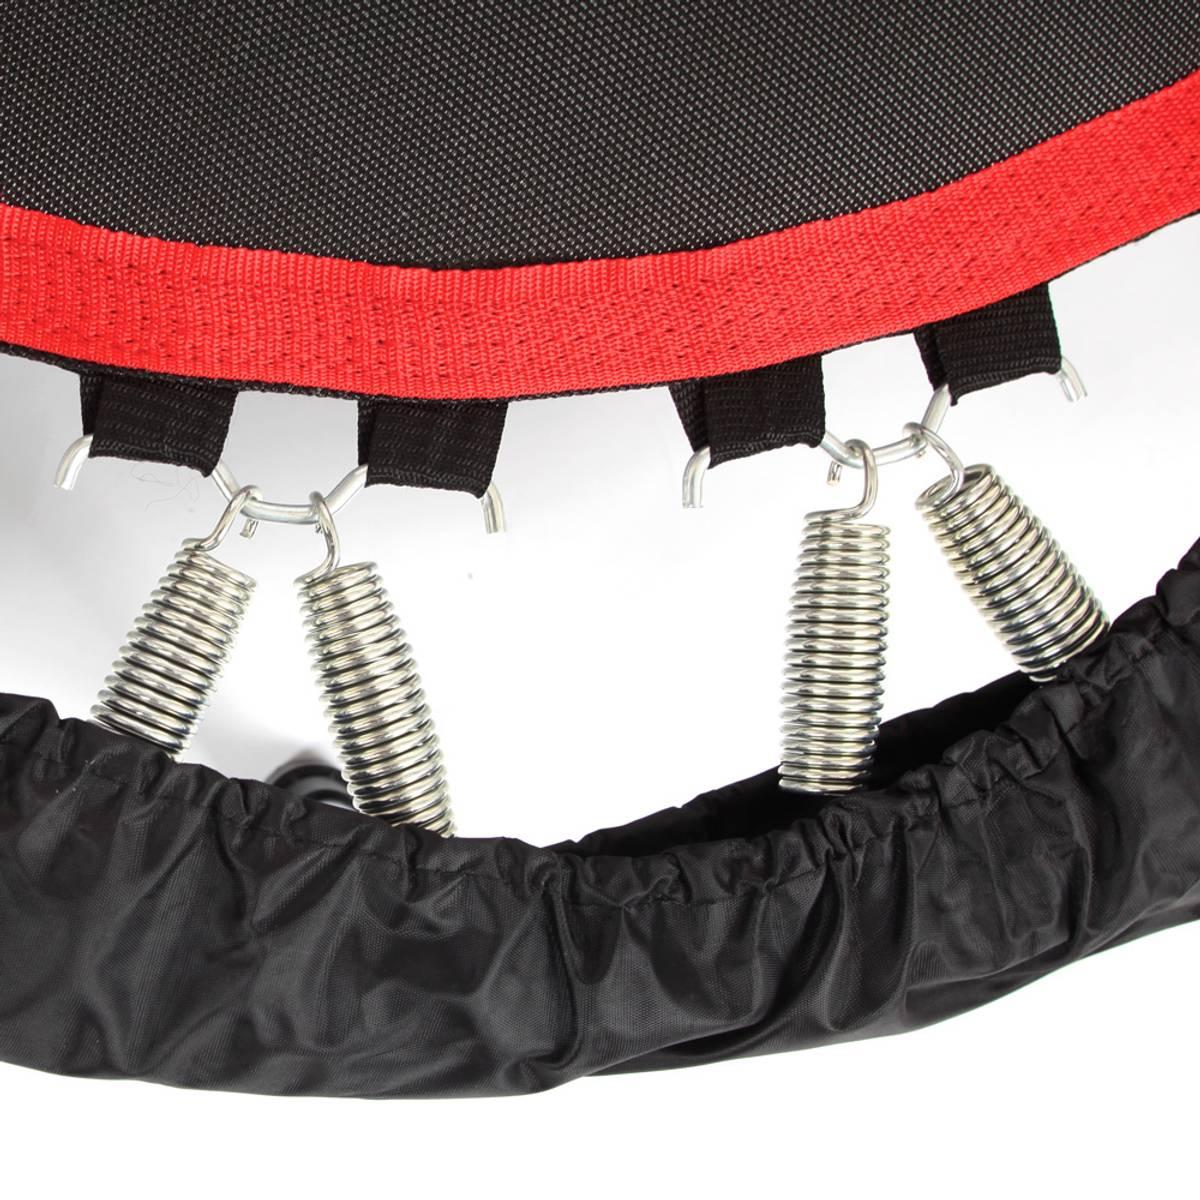 Fitness trampoline inSPORTline PROFI Digital 122cm